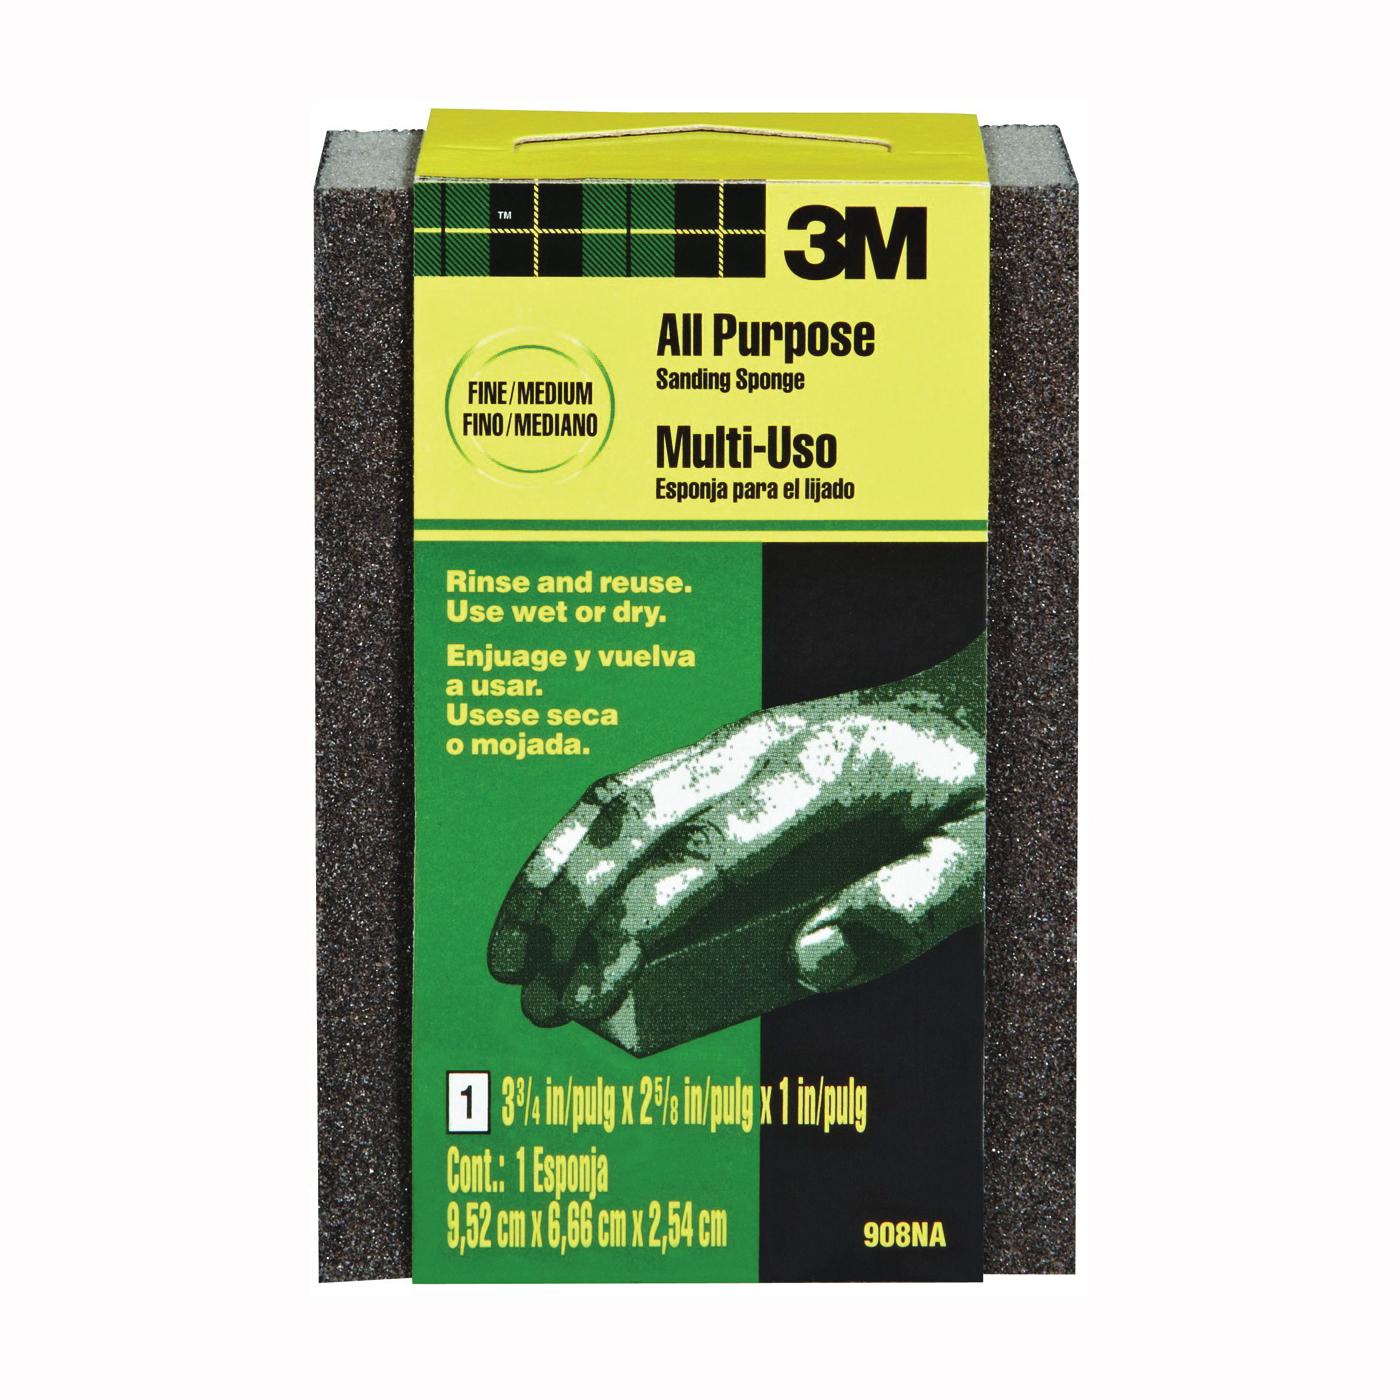 Picture of 3M 908 Sanding Sponge, 3-3/4 in L, 2-5/8 in W, Fine/Medium, Aluminum Oxide Abrasive